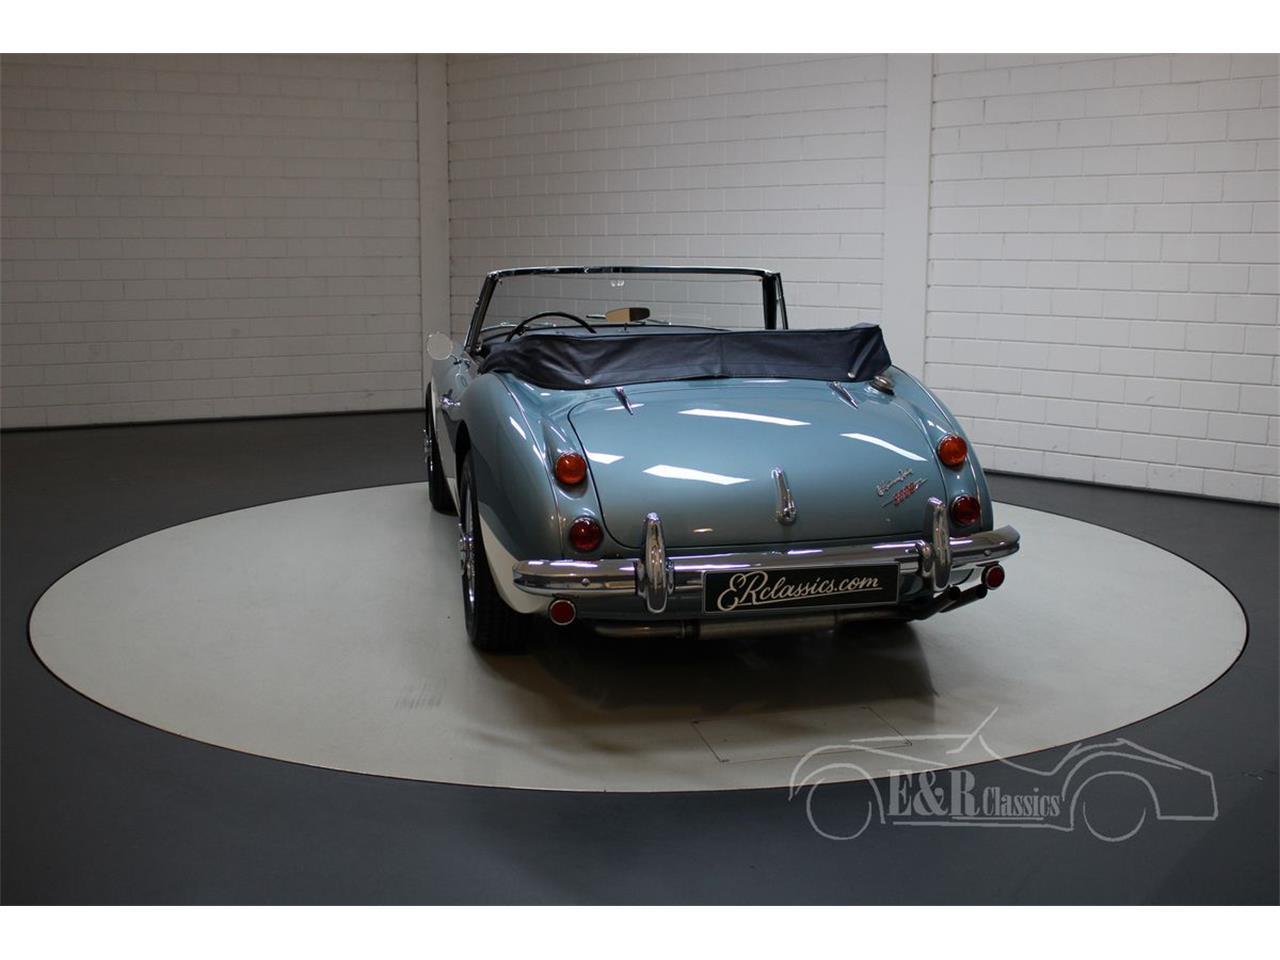 1965 Austin-Healey 3000 Mark III (CC-1387559) for sale in Waalwijk, Noord Brabant